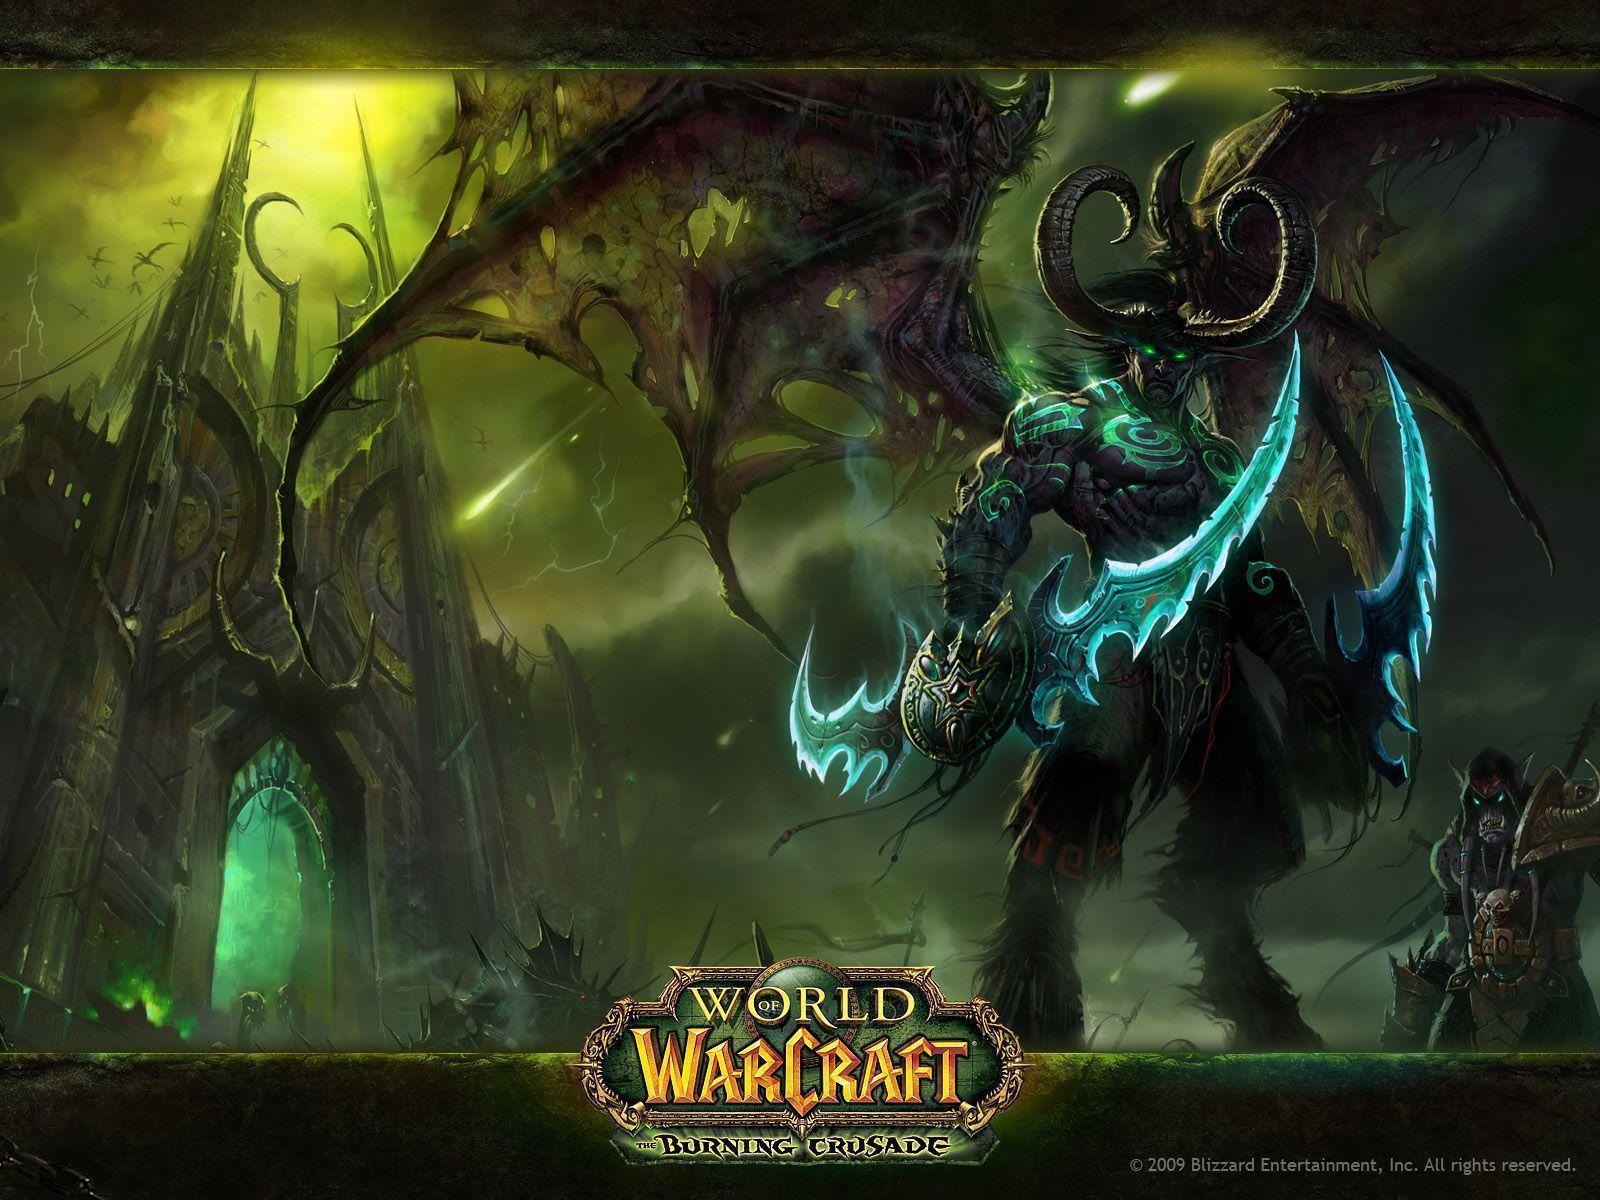 Blizzard Entertainment:World of Warcraft: The Burning Crusade